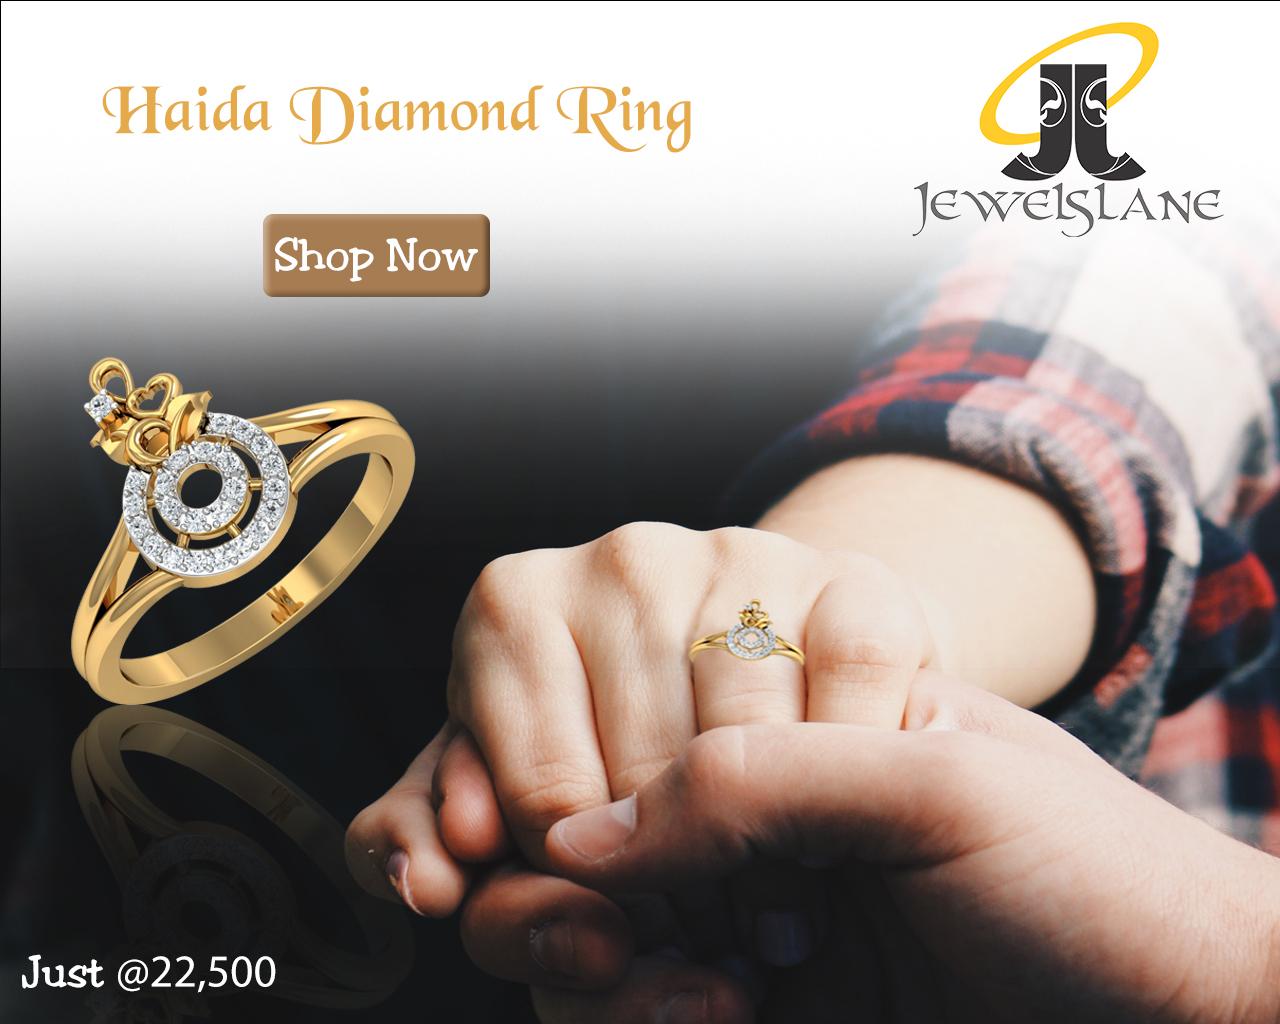 Haida Diamond Ring